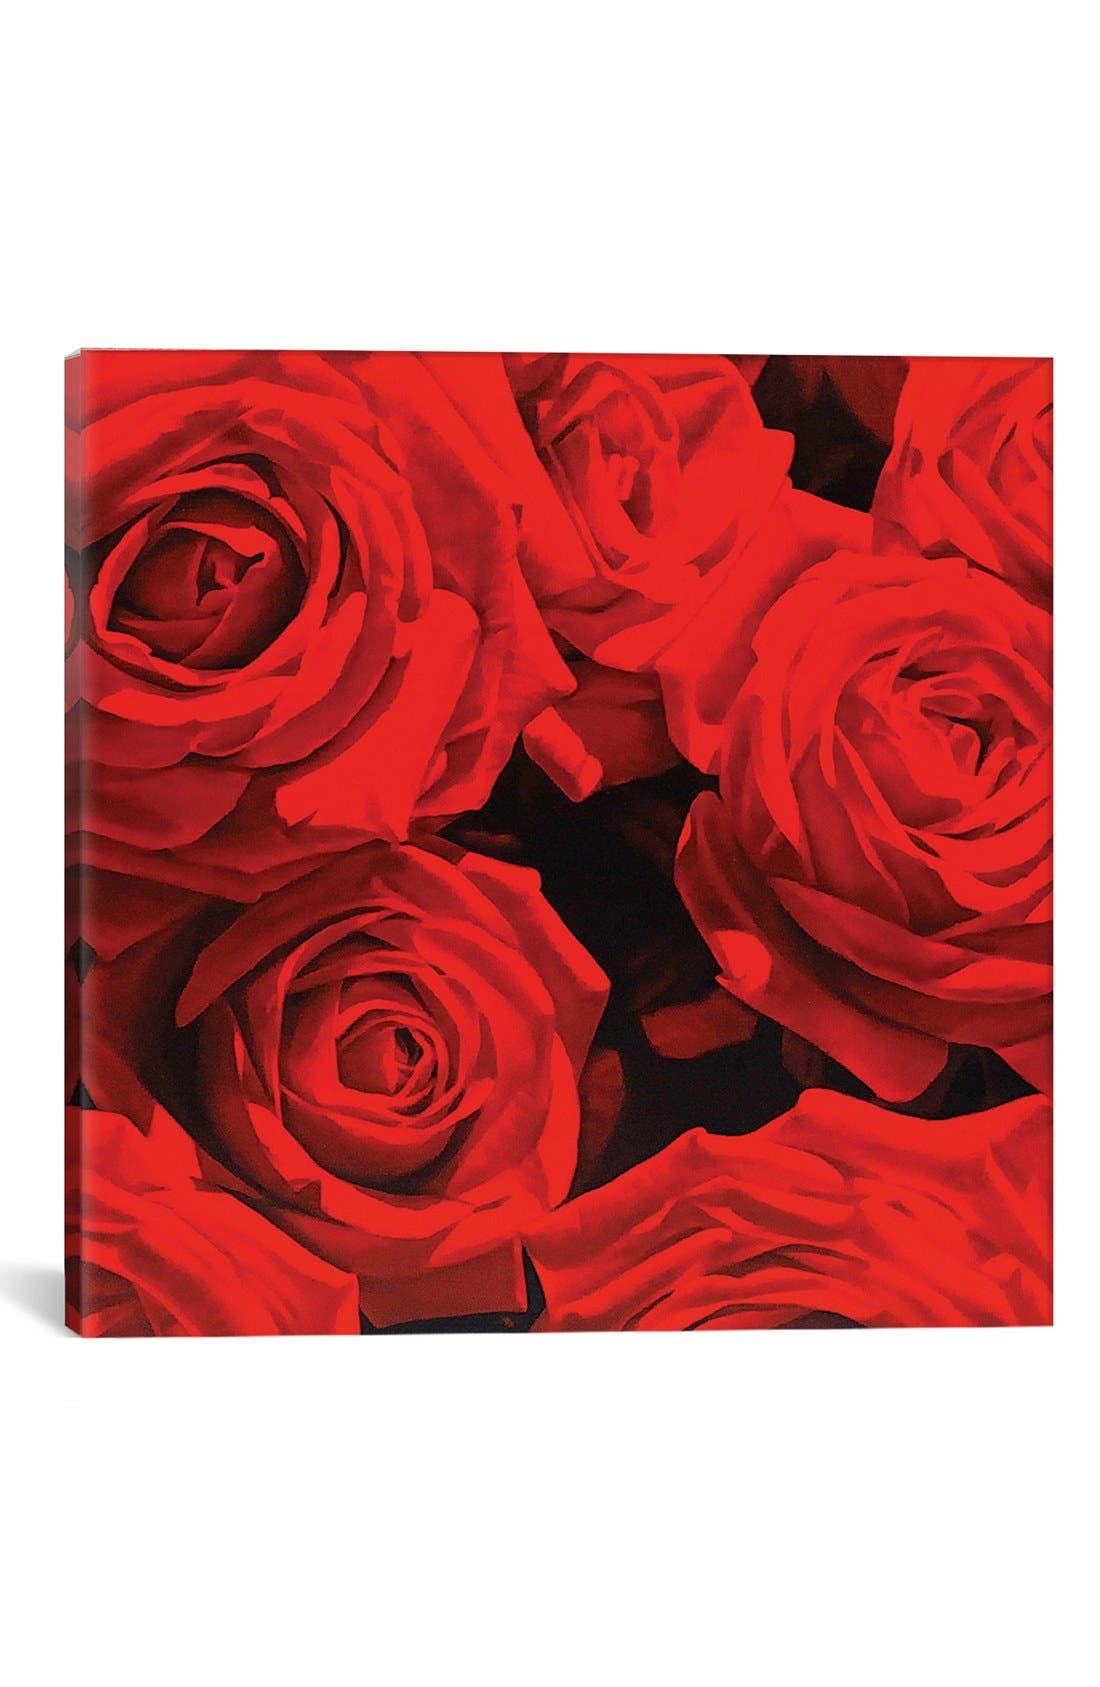 'Red Roses' Giclée Print Canvas Art,                             Main thumbnail 1, color,                             600